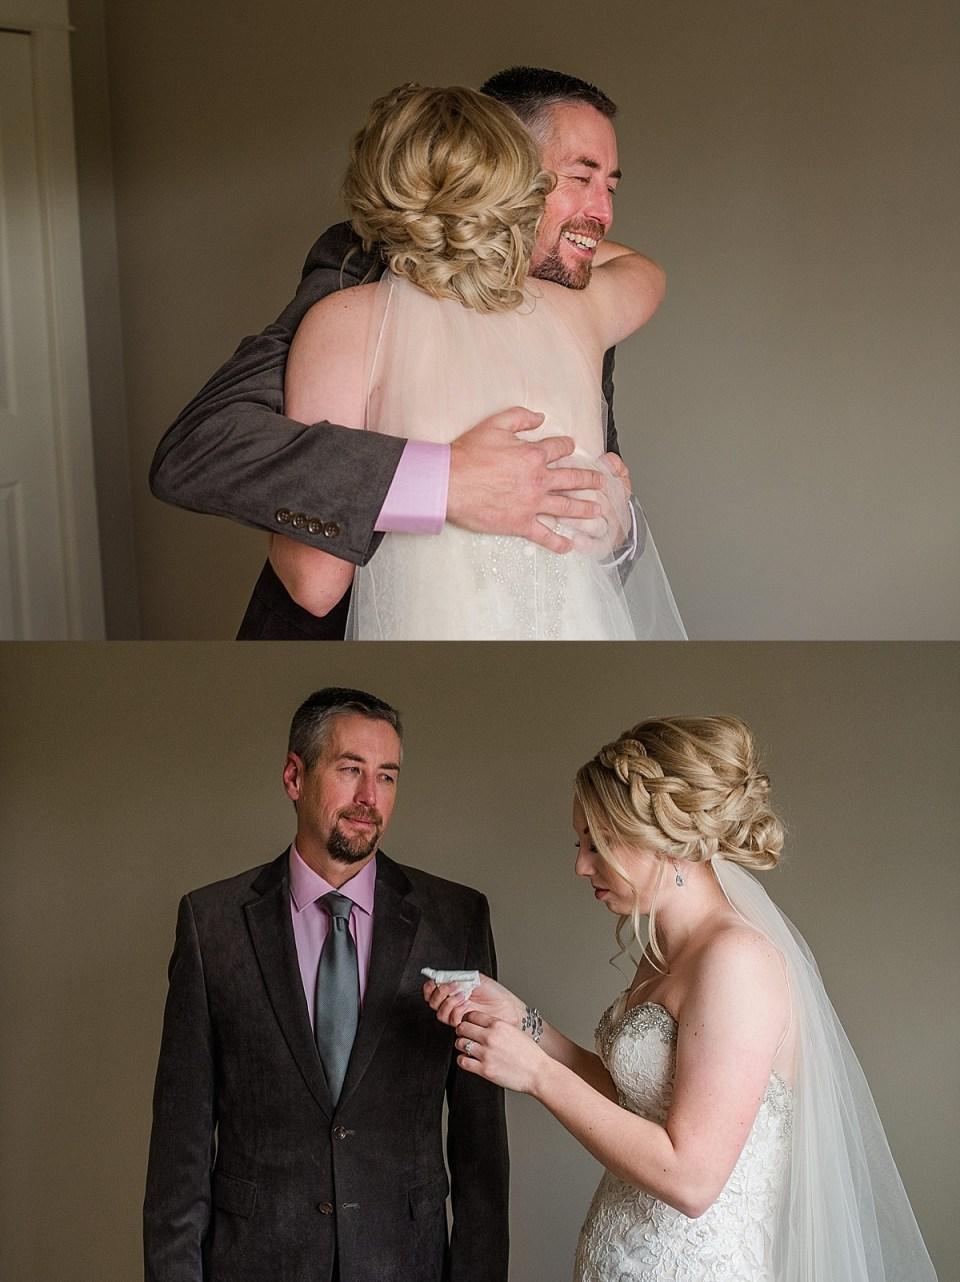 A Rustic Wedding Celebration at Westwoods Community Center | Stettler Weddings | Stettler and area wedding photographers | Country wedding | Jaden + Lance